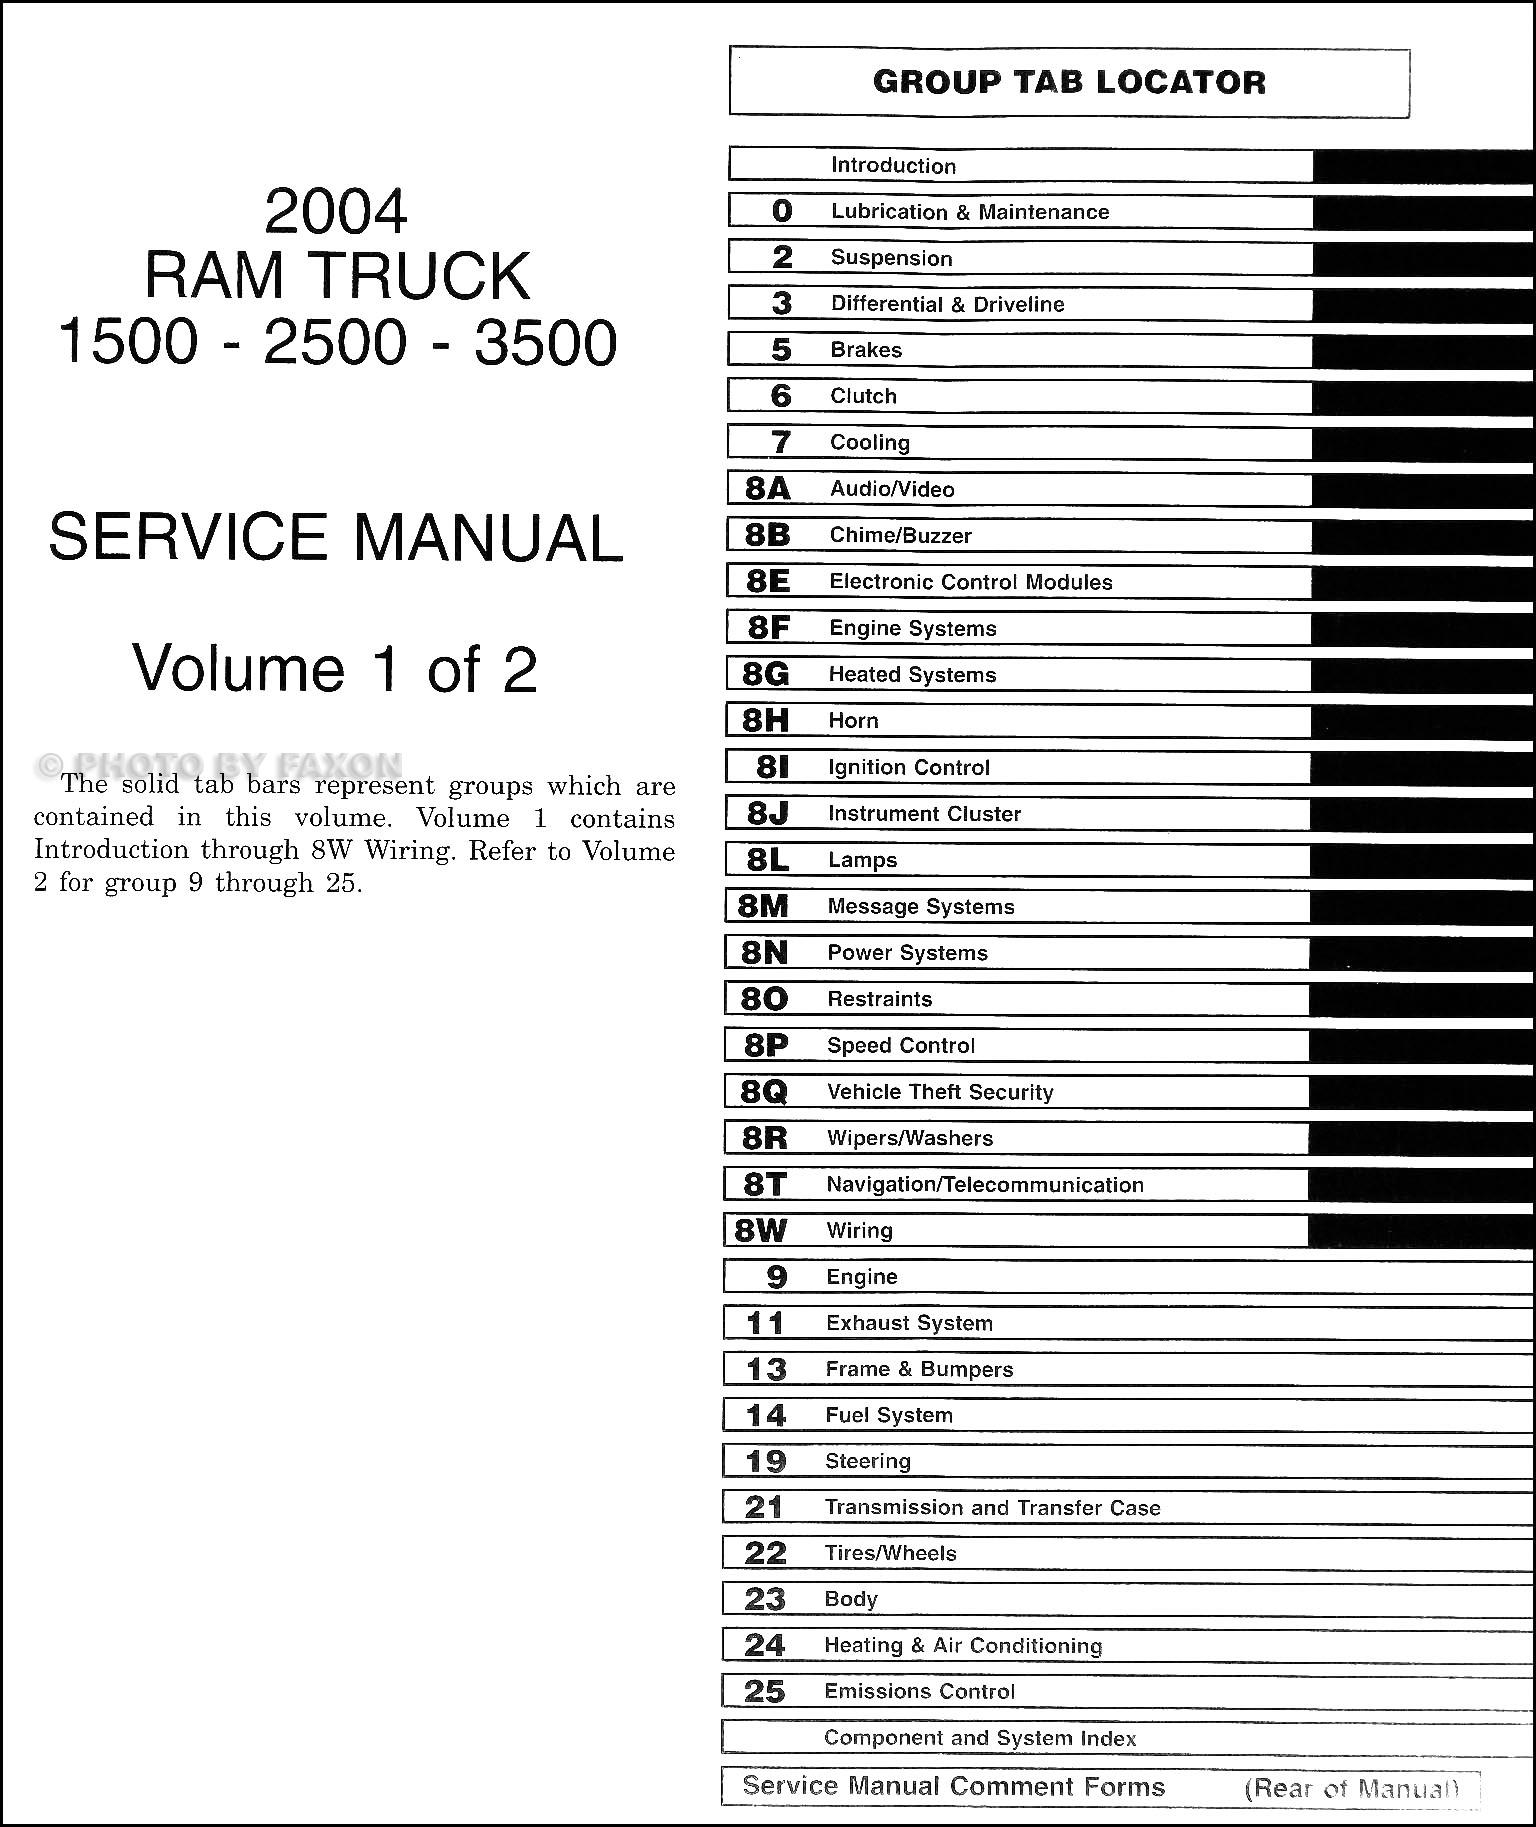 2004 dodge truck wiring diagram wx 8606  2004 dodge ram 3500 fuse diagram download diagram  2004 dodge ram 3500 fuse diagram